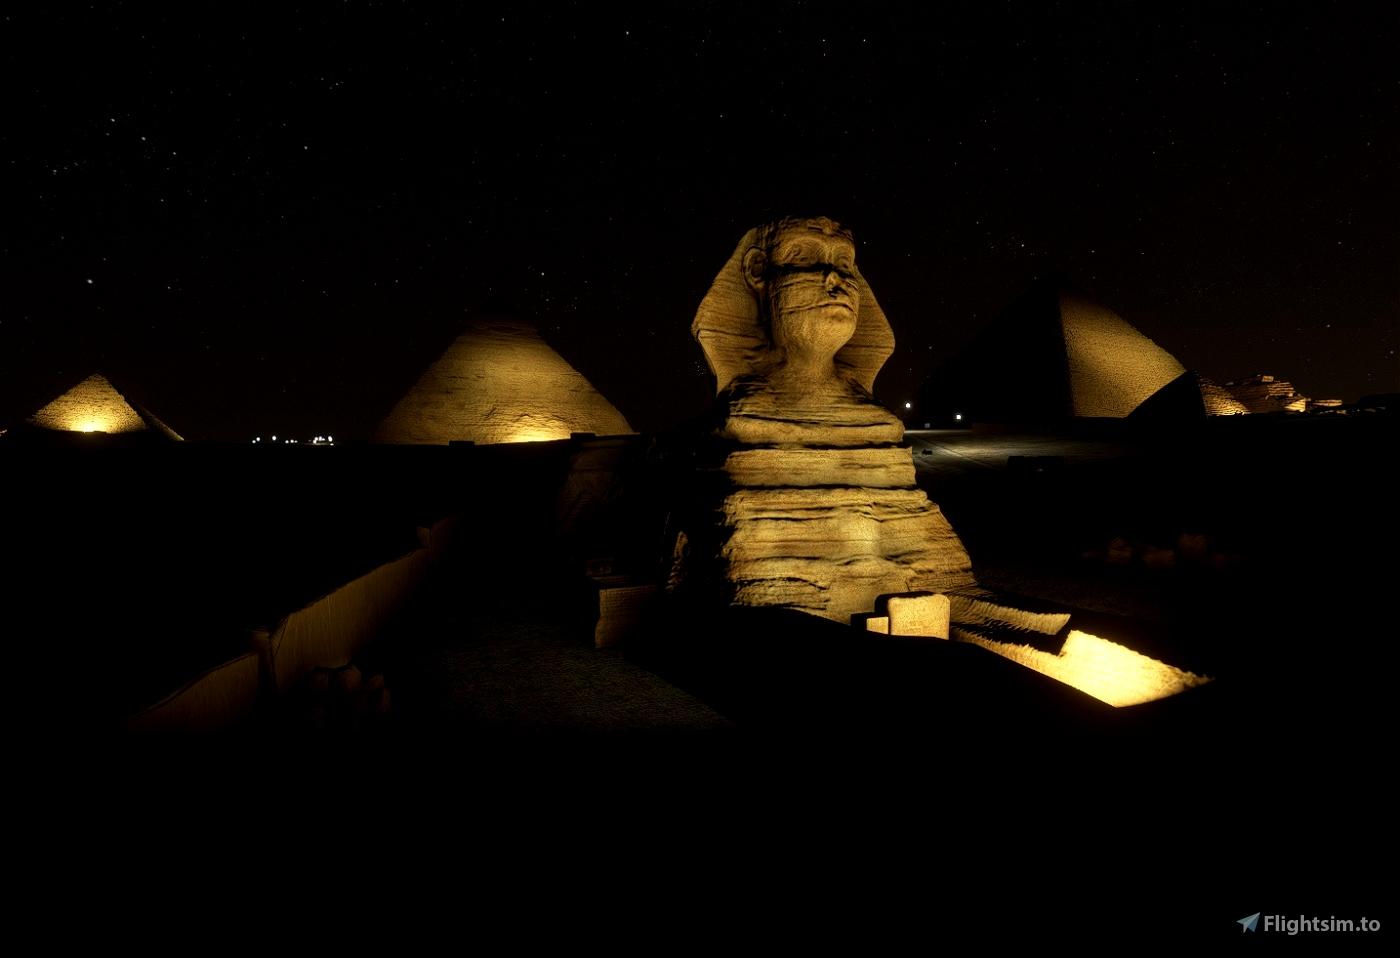 The Great Pyramids + Sphinx of Giza, Cairo, EGY - NIGHT LIGHTING SET Flight Simulator 2020